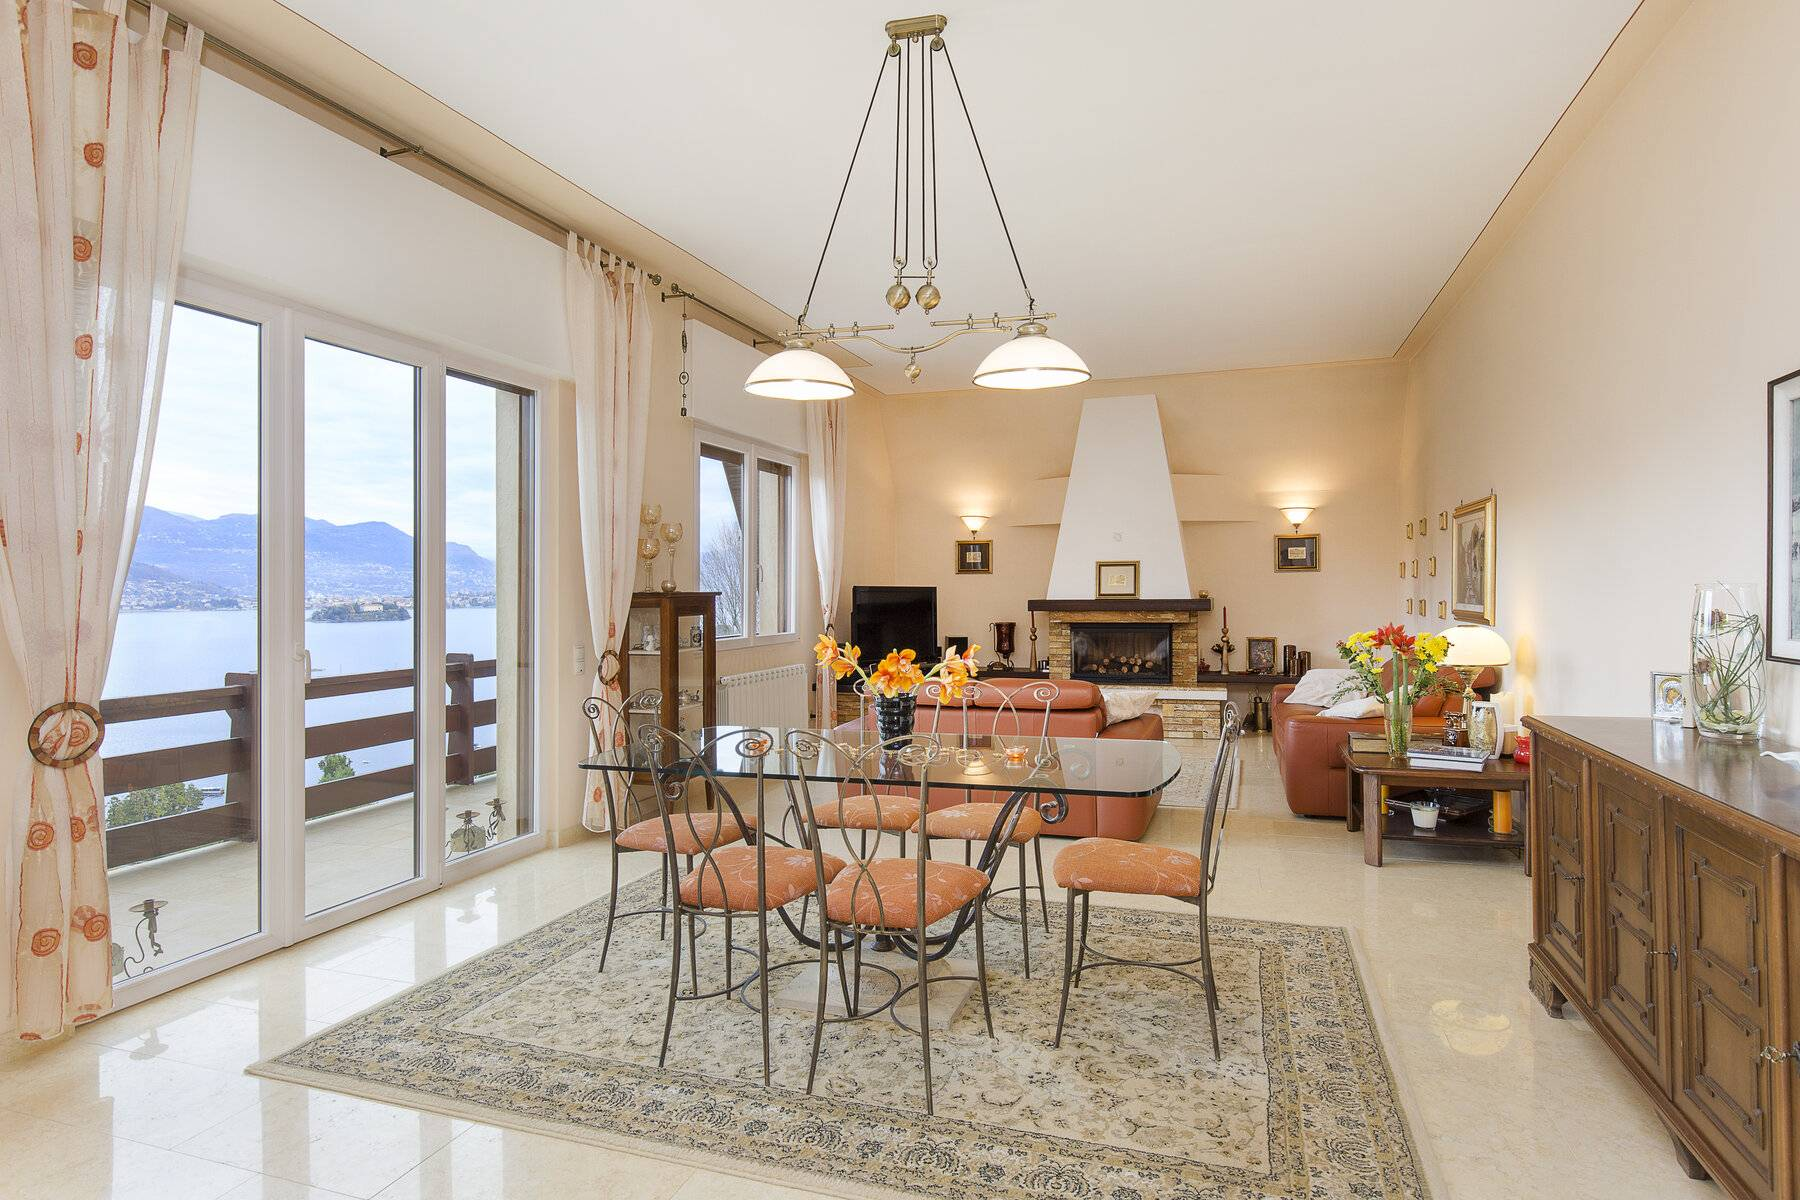 Villa in Vendita a Stresa: 5 locali, 364 mq - Foto 13